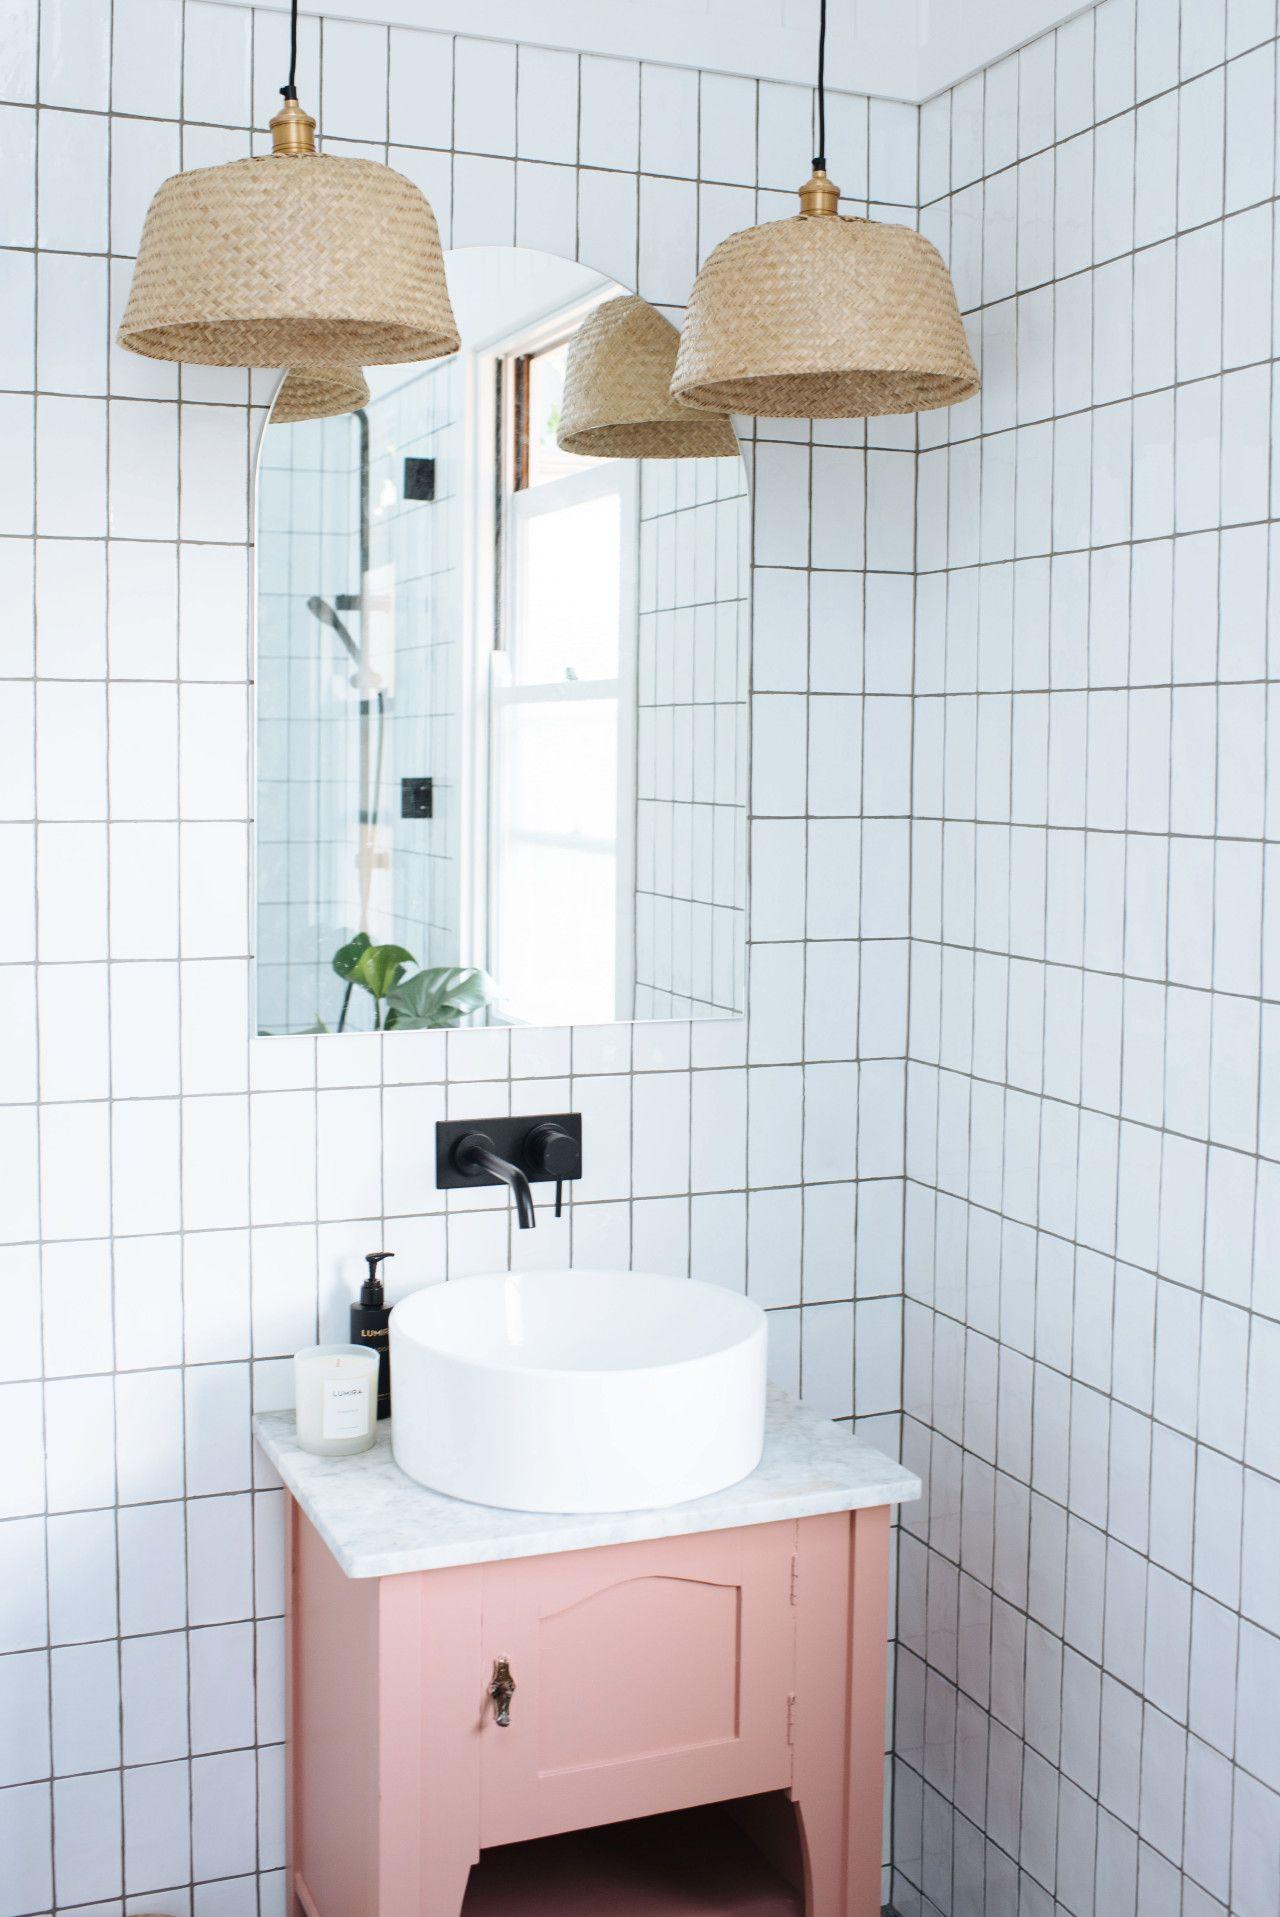 Diy Basket Pendant Lights An Ikea Hack Vintage Bathroom Vanities Ikea Basket Ikea Hack